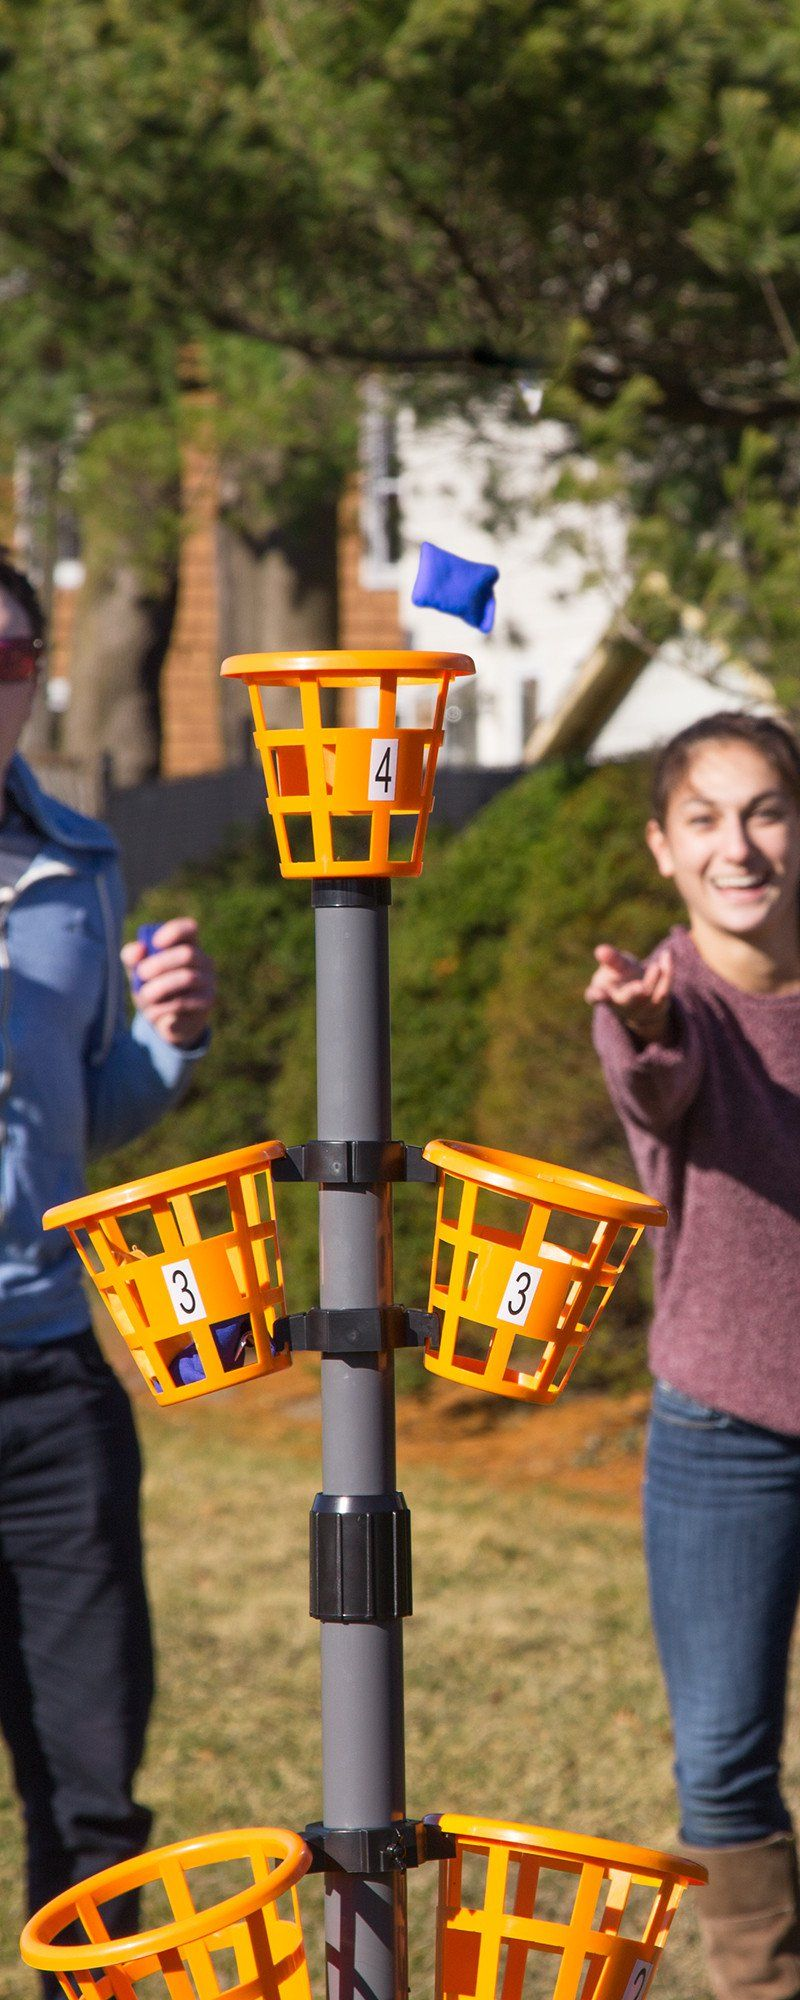 Bean Bag Basket Toss Game Games Camping Games Outdoor